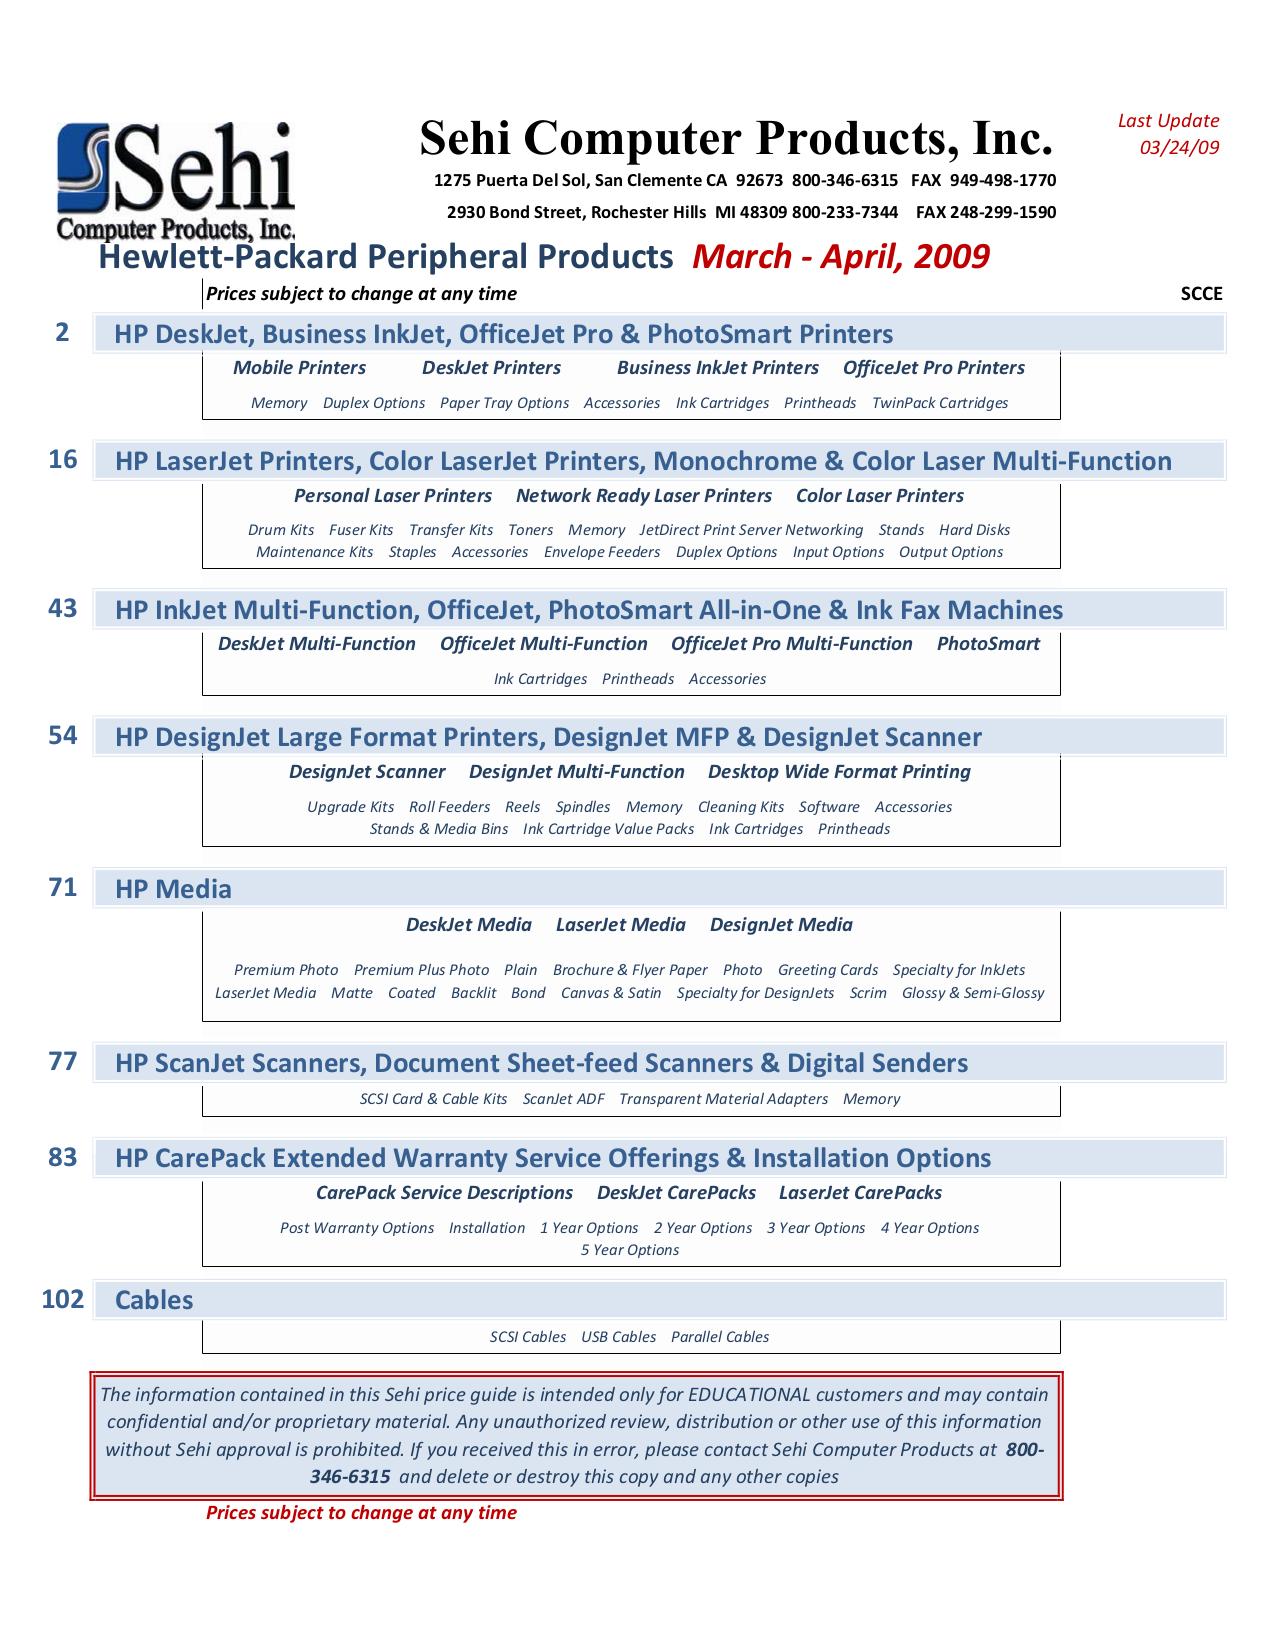 hp officejet j4680 manual pdf